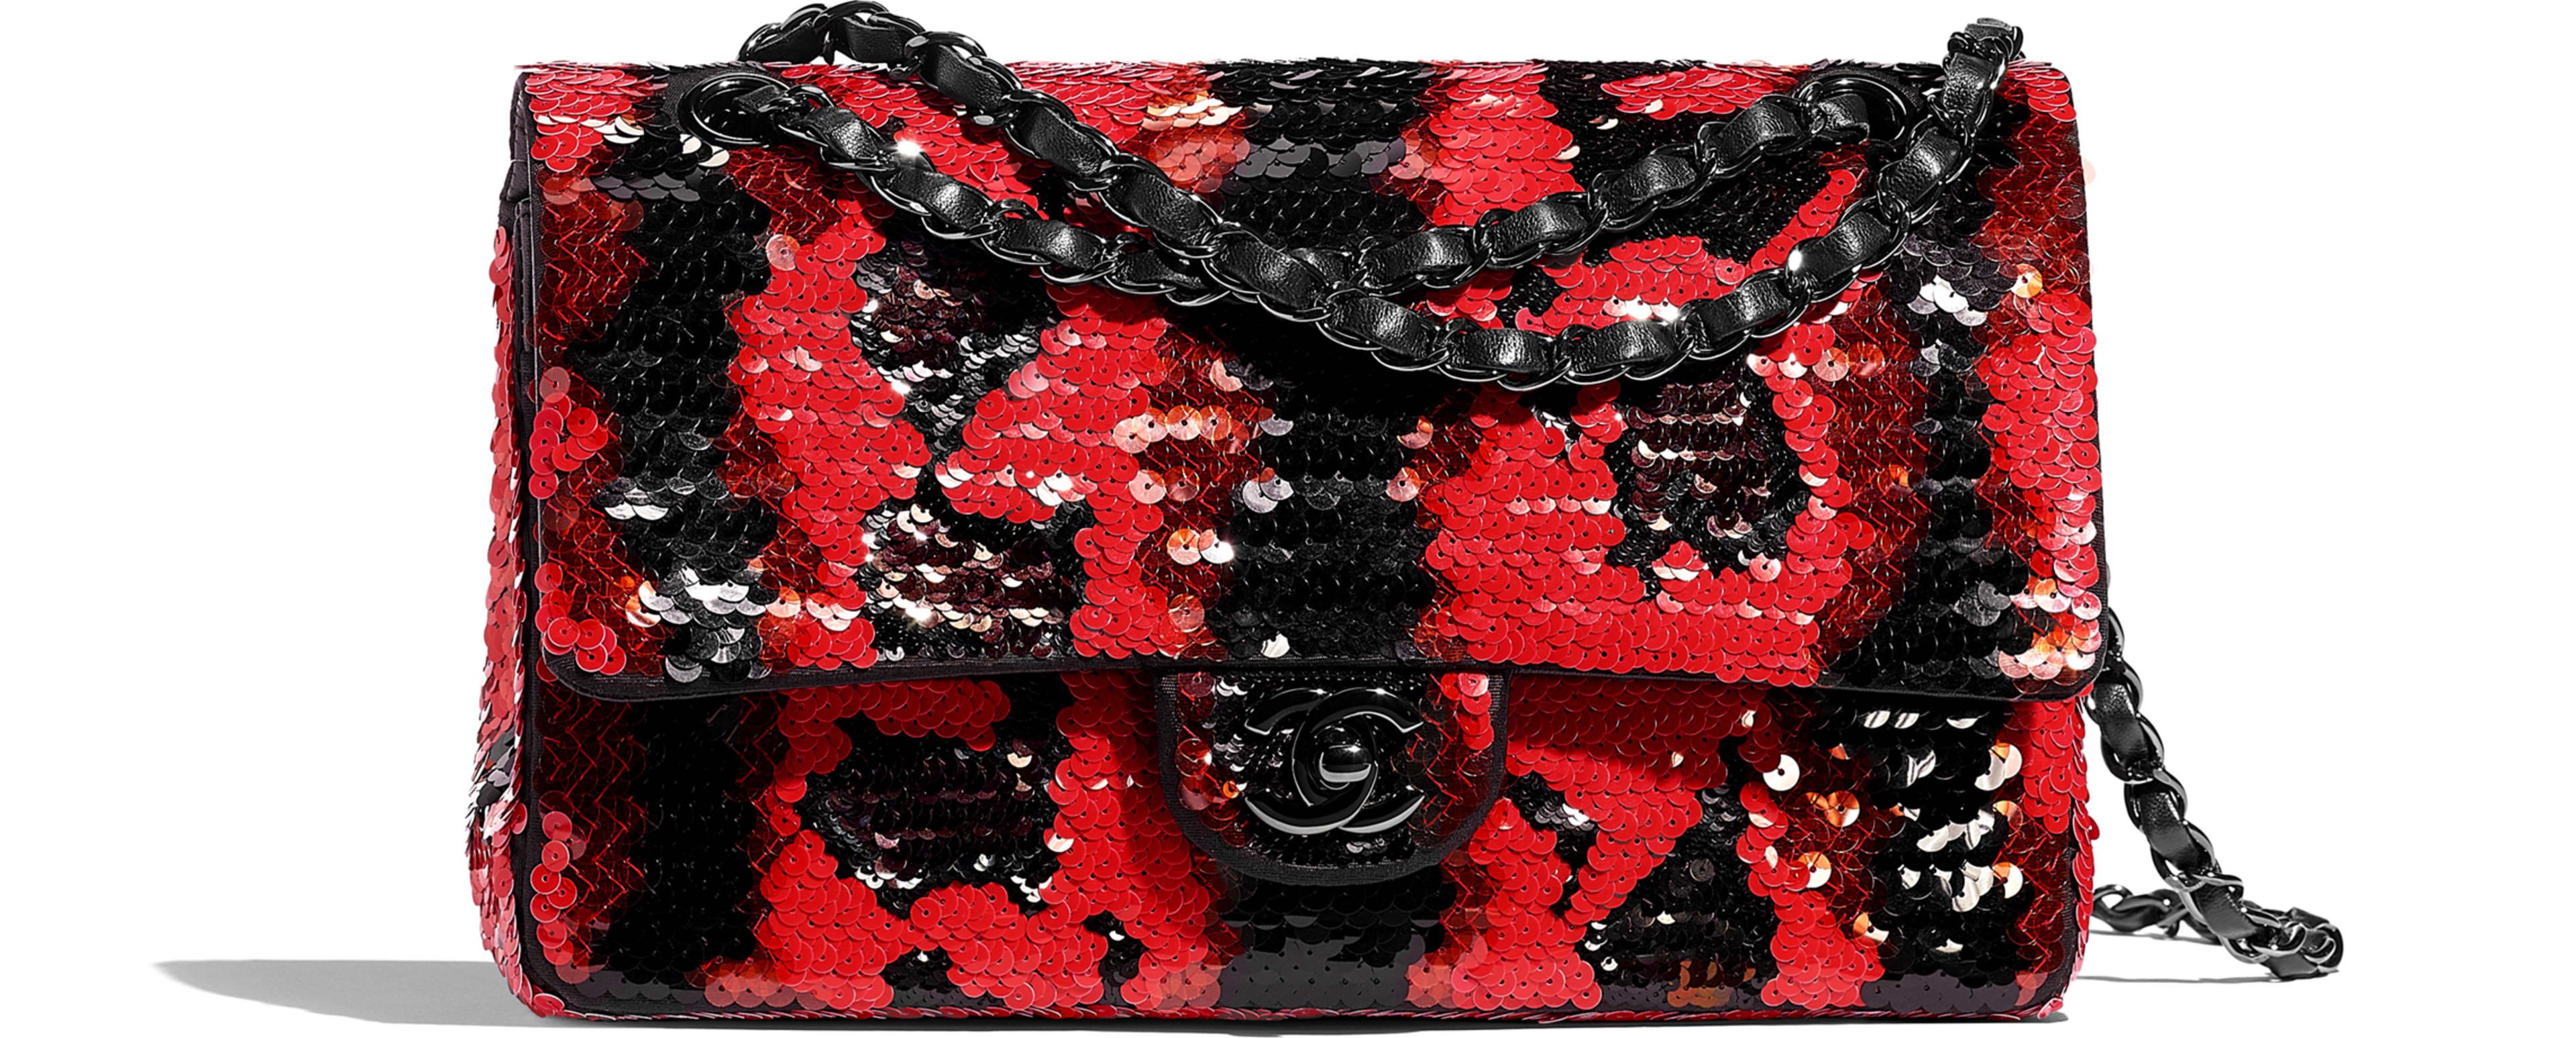 Sequins & Black Metal Red & Black